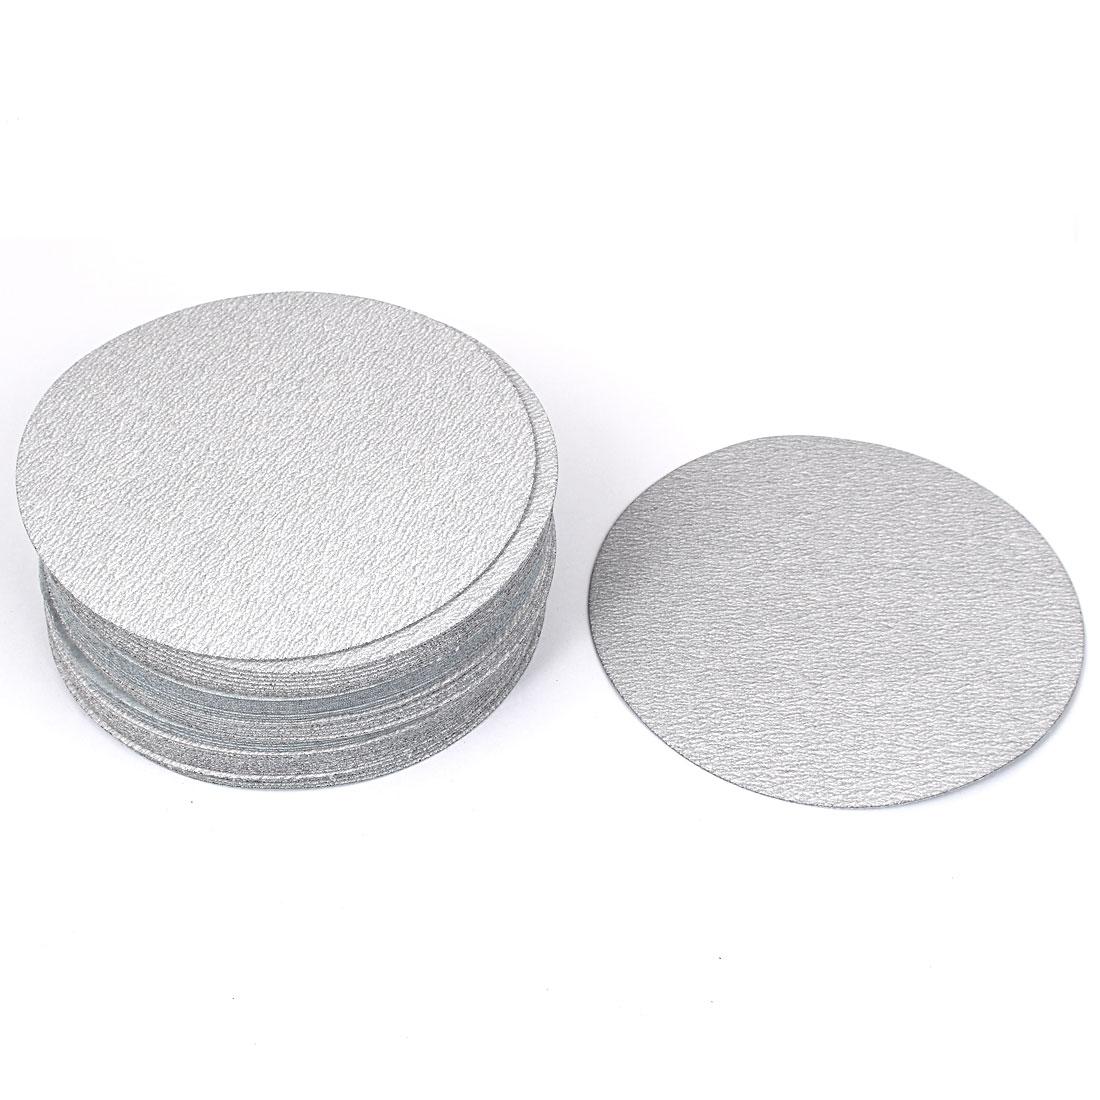 "6"" Dia Polishing Round Dry Abrasive Sanding Sandpaper Sheet Disc 240 Grit 50 Pcs"